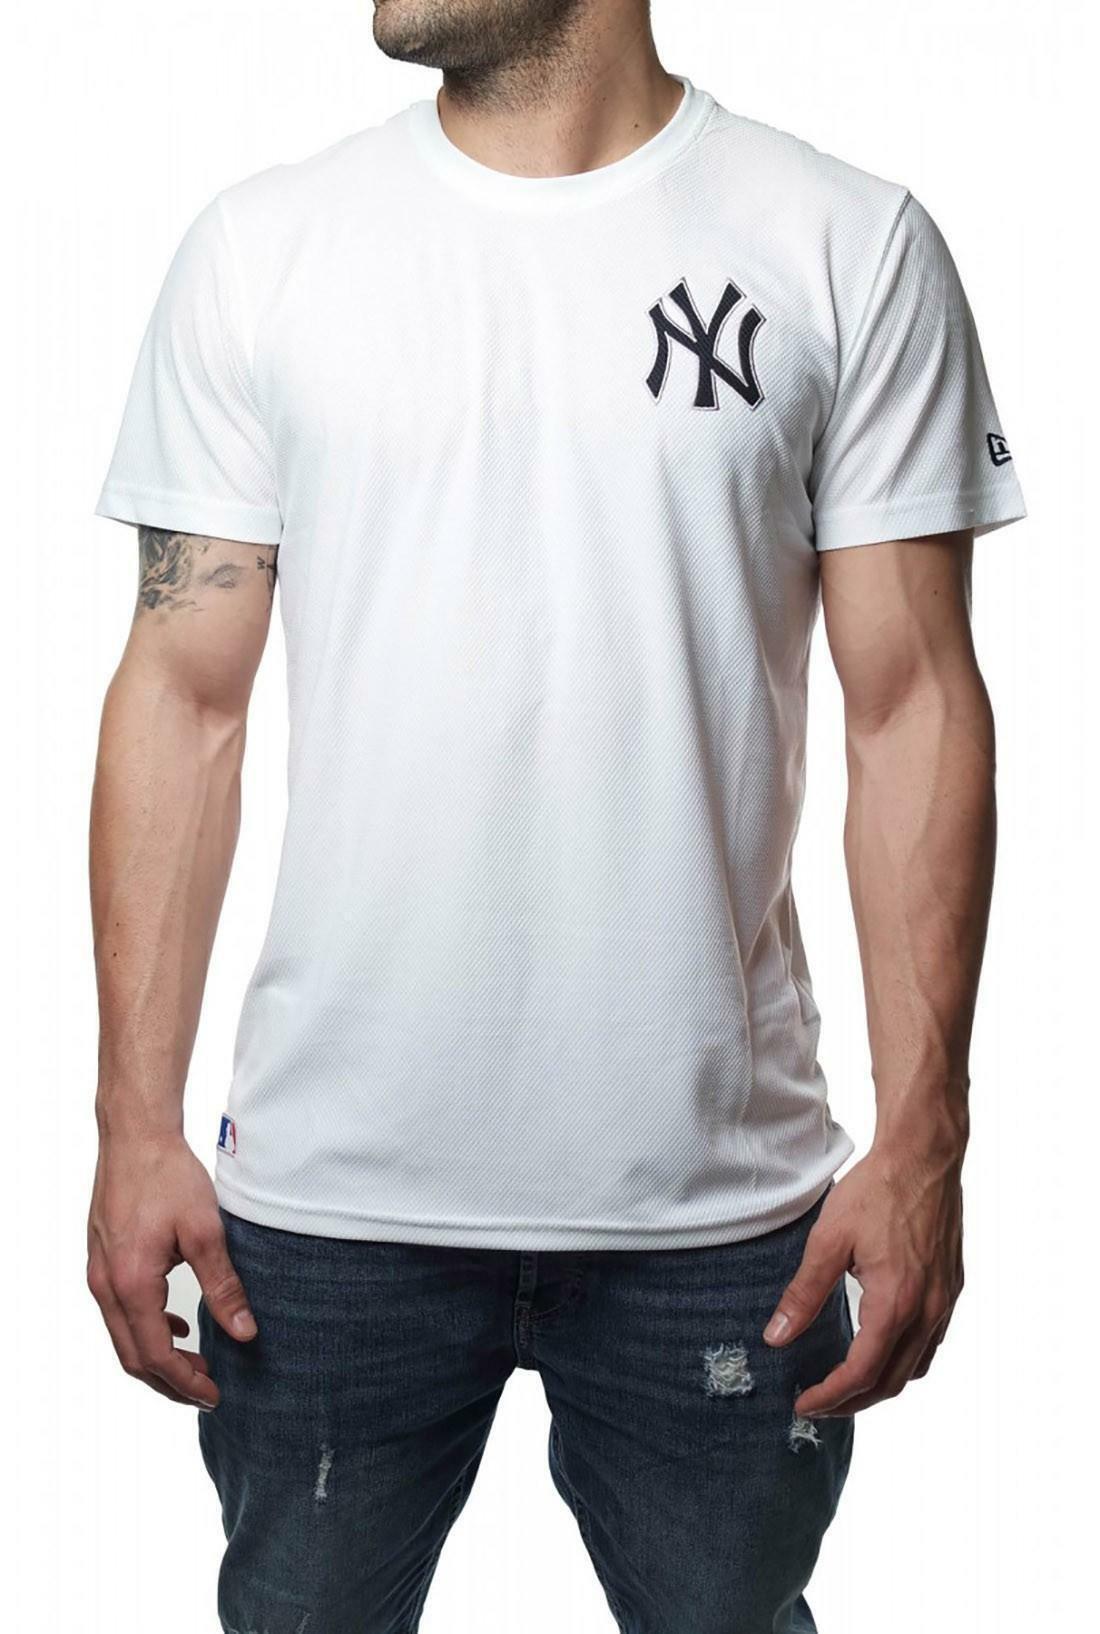 new era new era diam era cst tee neyyan t-shirt uomo bianca 11244588